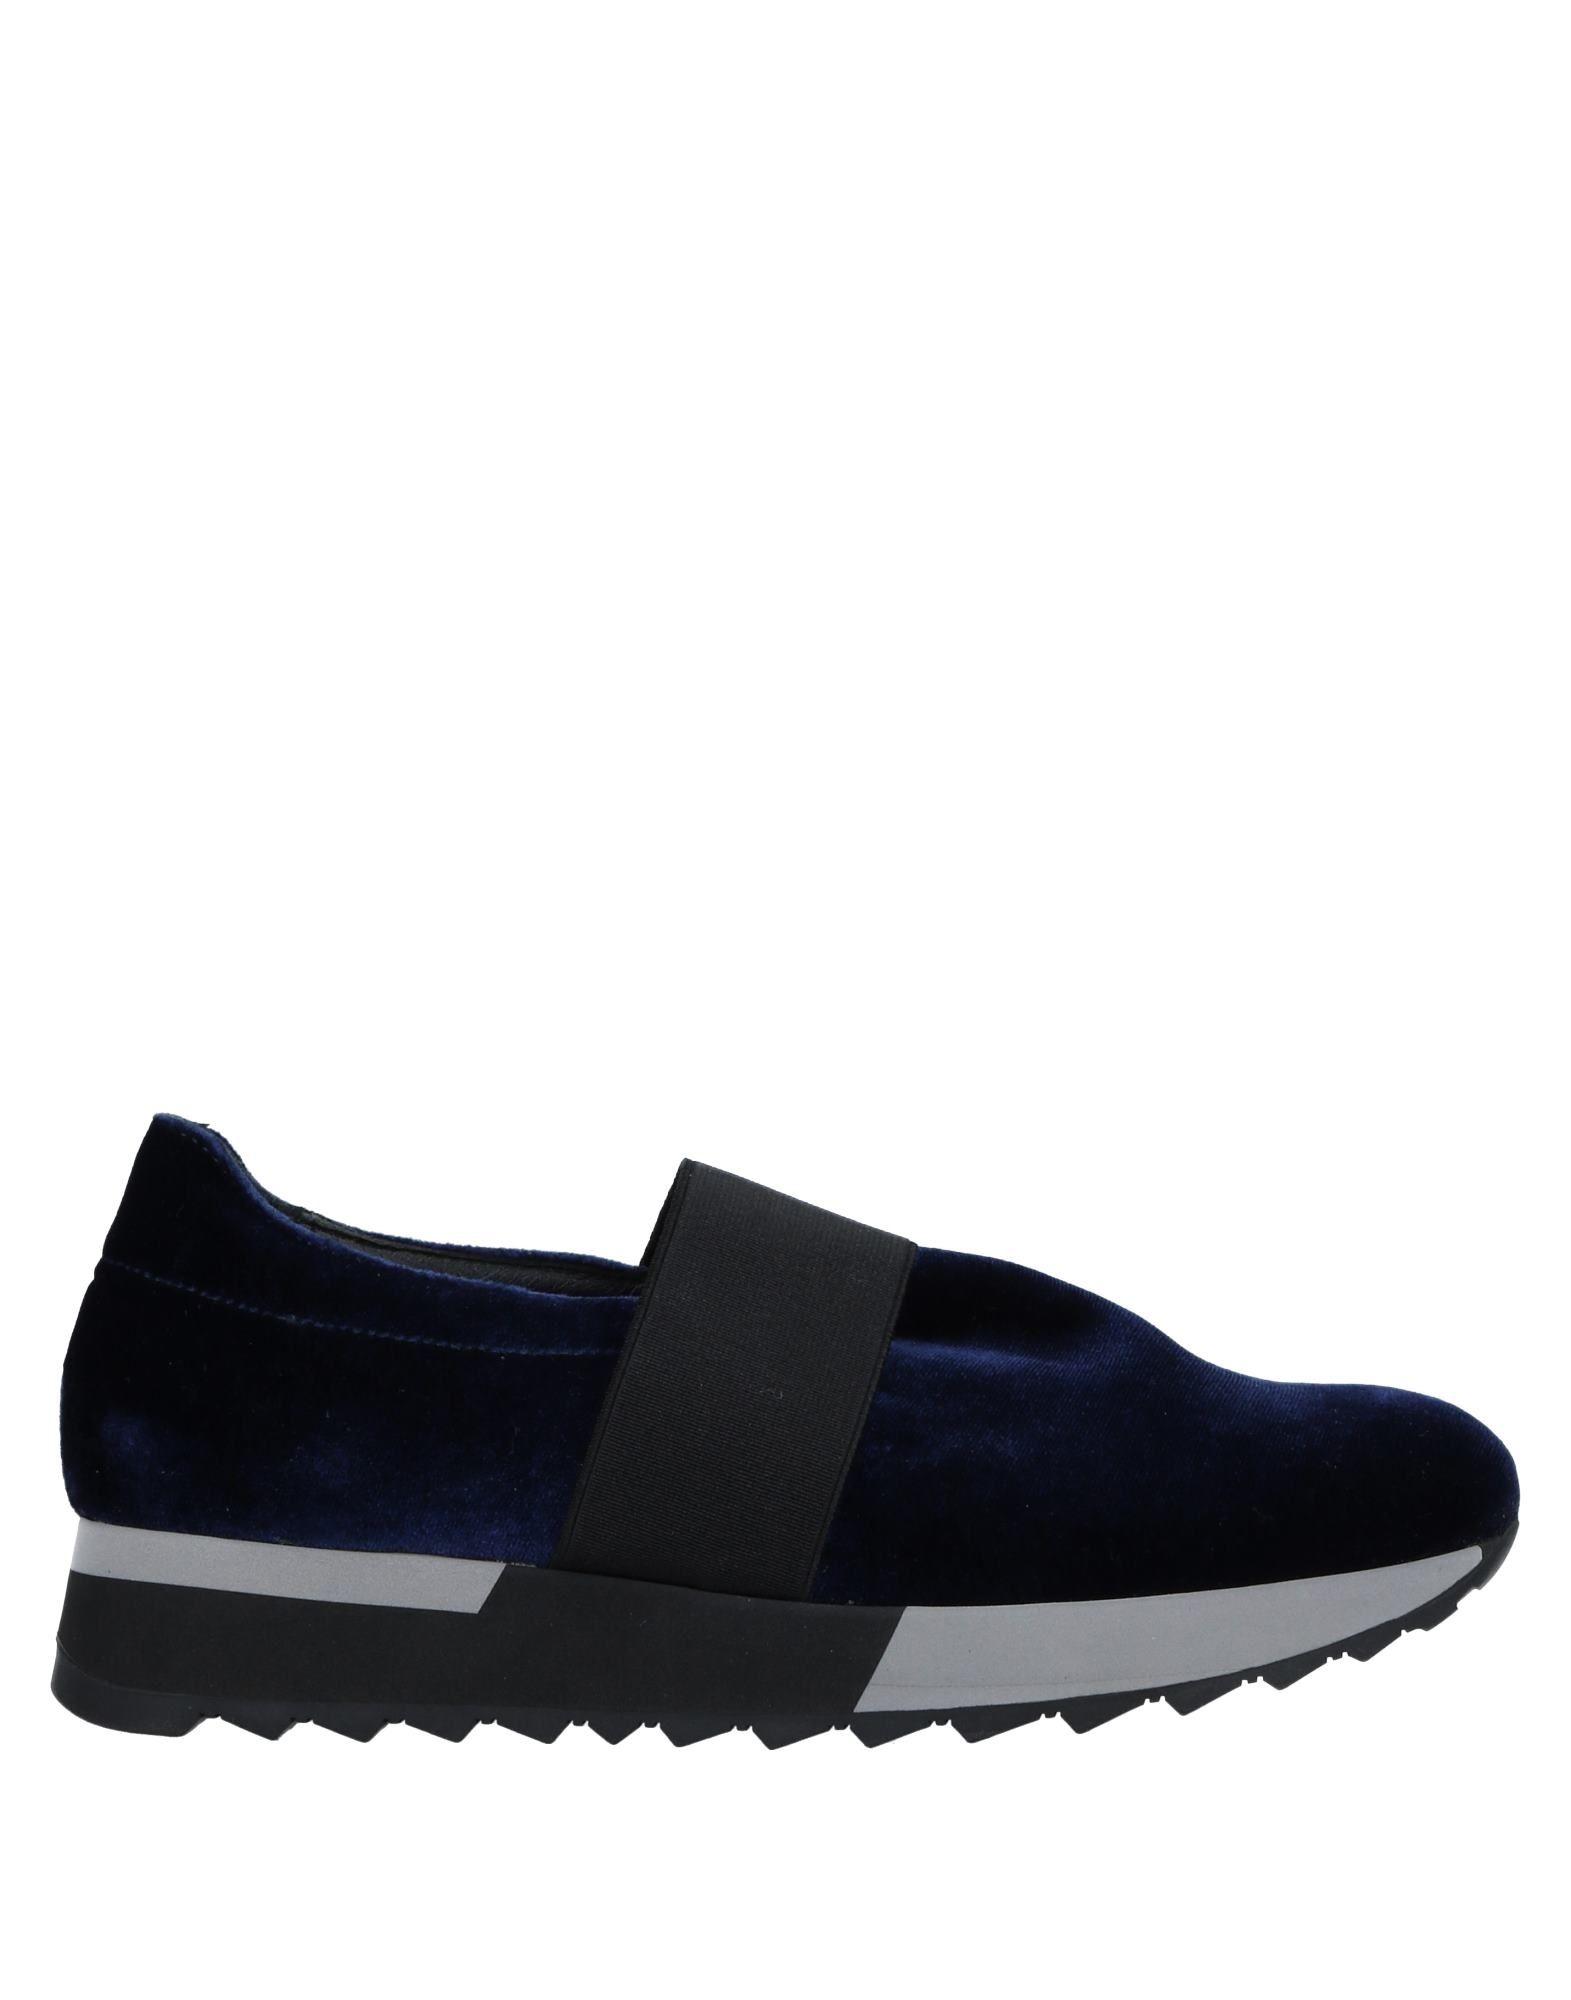 Angela George Sneakers Damen    11533977GP Gute Qualität beliebte Schuhe d44c49